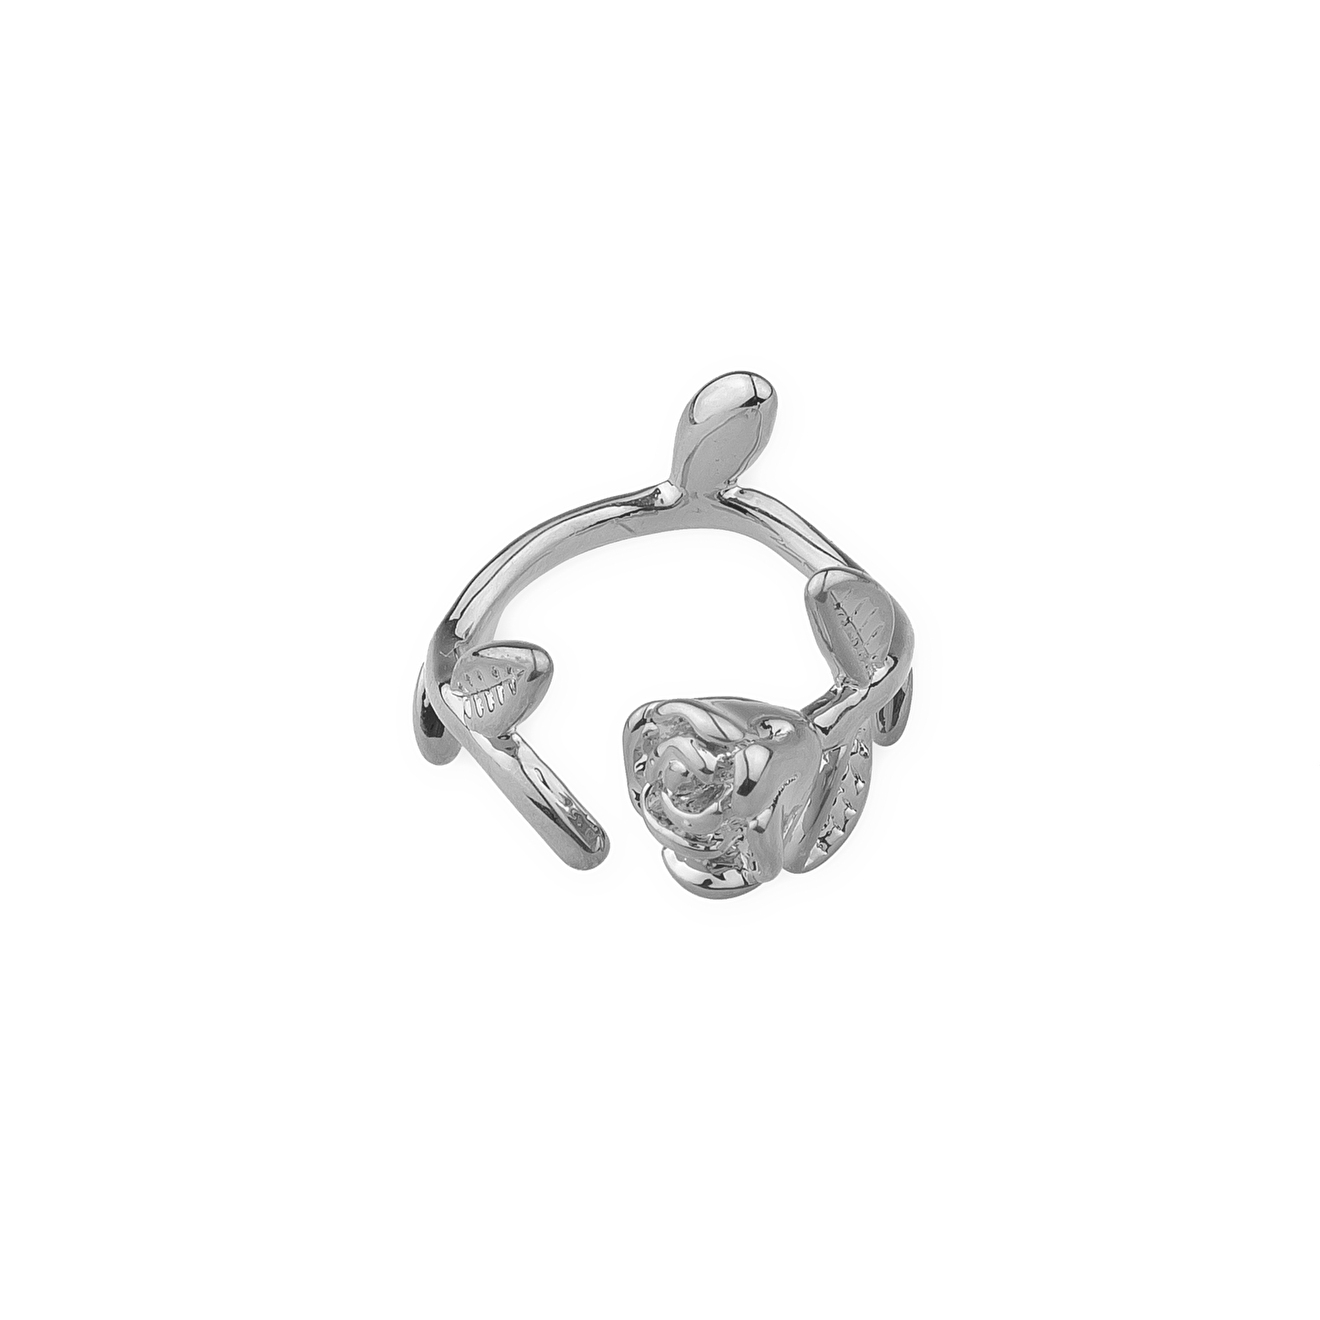 Herald Percy Серебристое кольцо-цветок